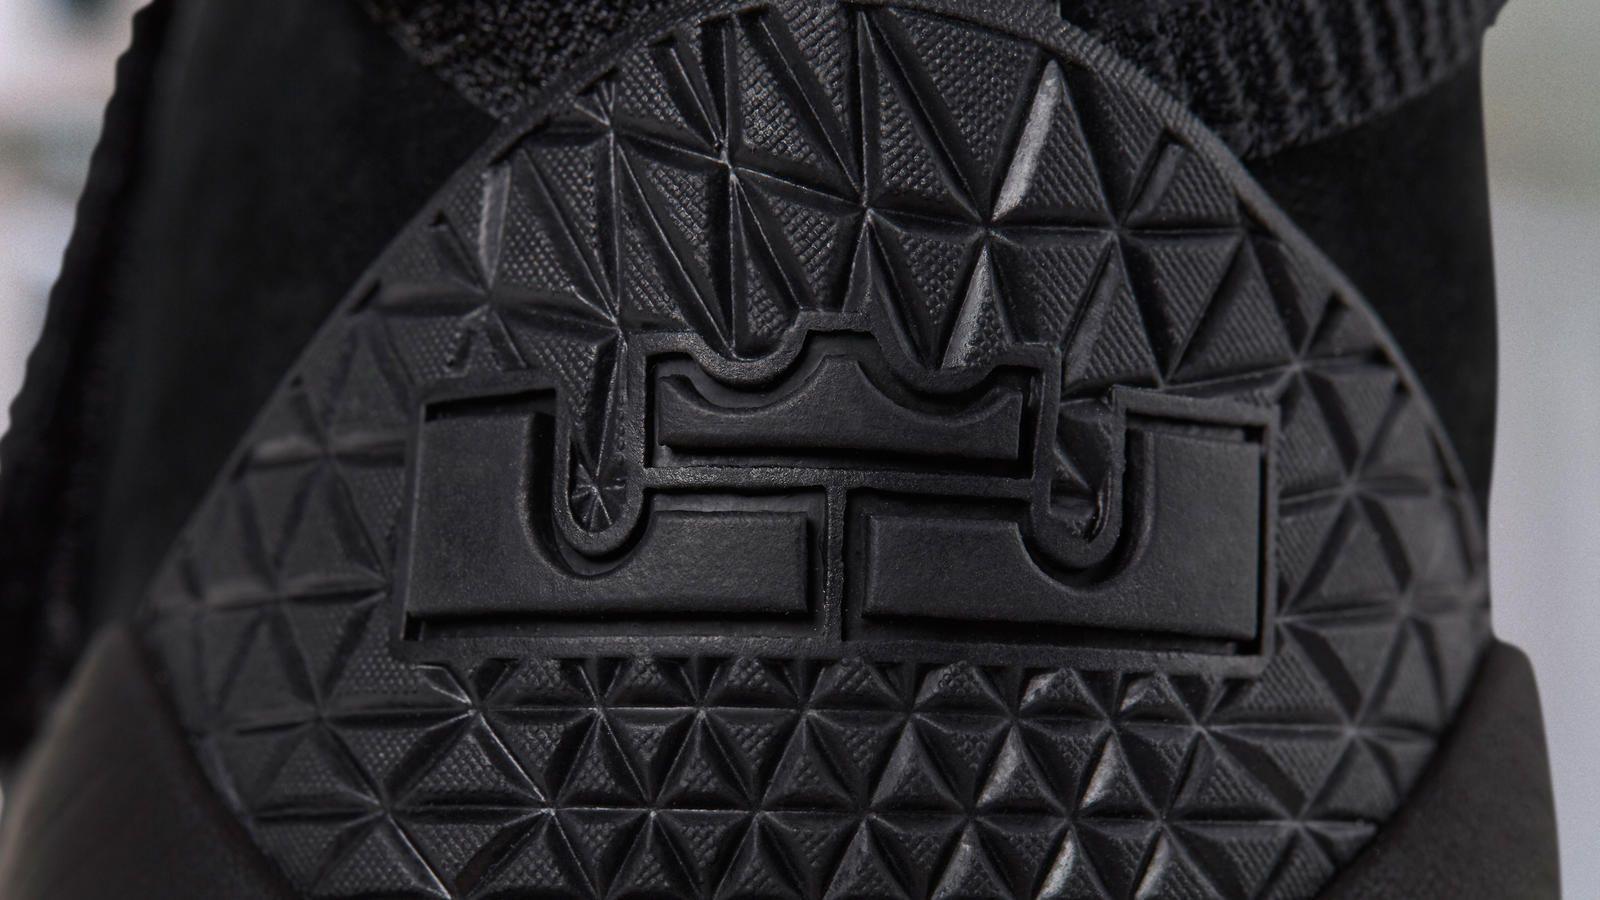 5c6e700c68a6 Nike Zoom LeBron Soldier 11 Prototype - Nike News